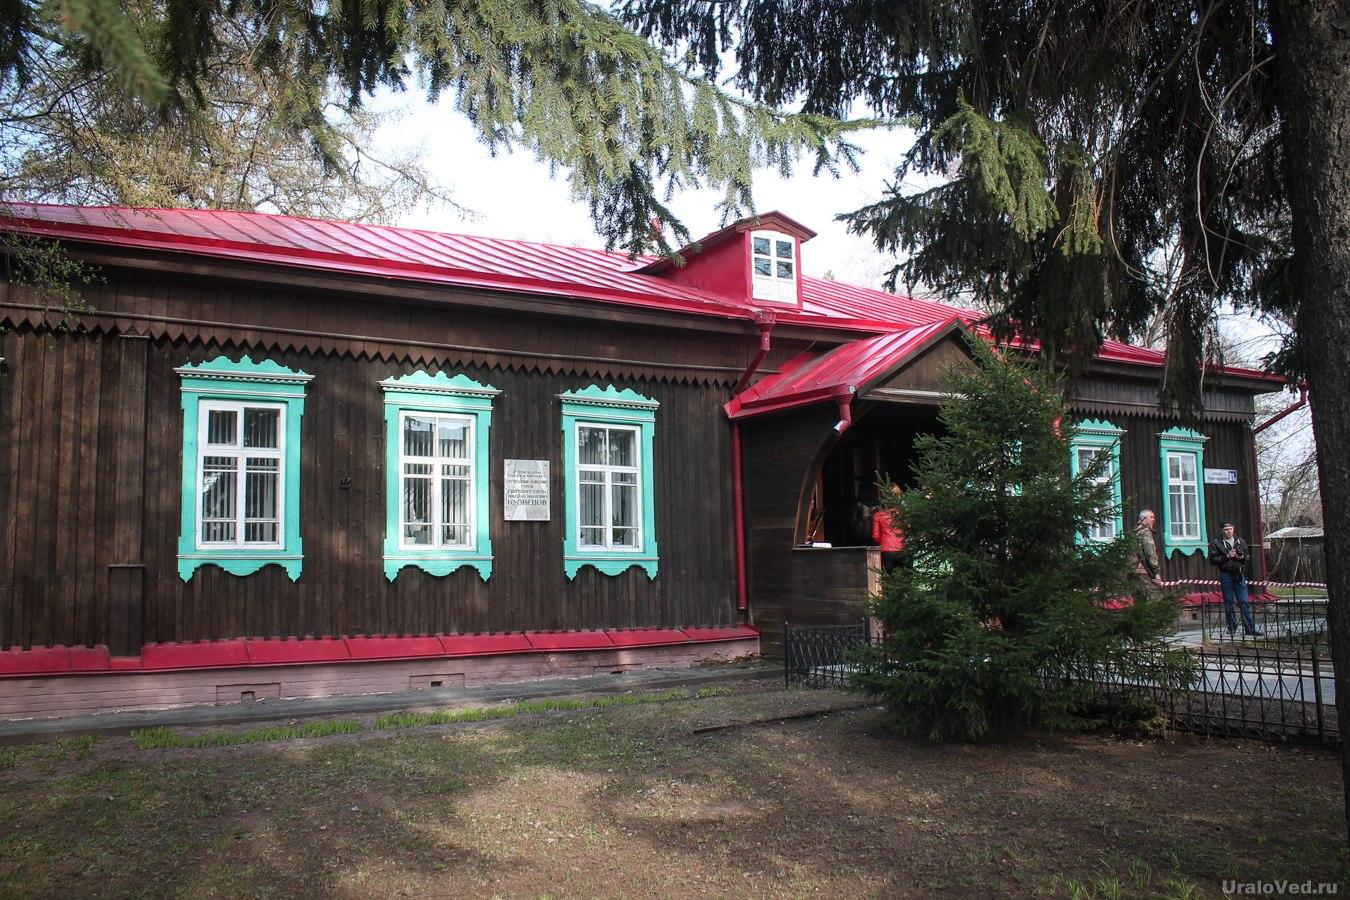 Музей Николая Кузнецова в Талице